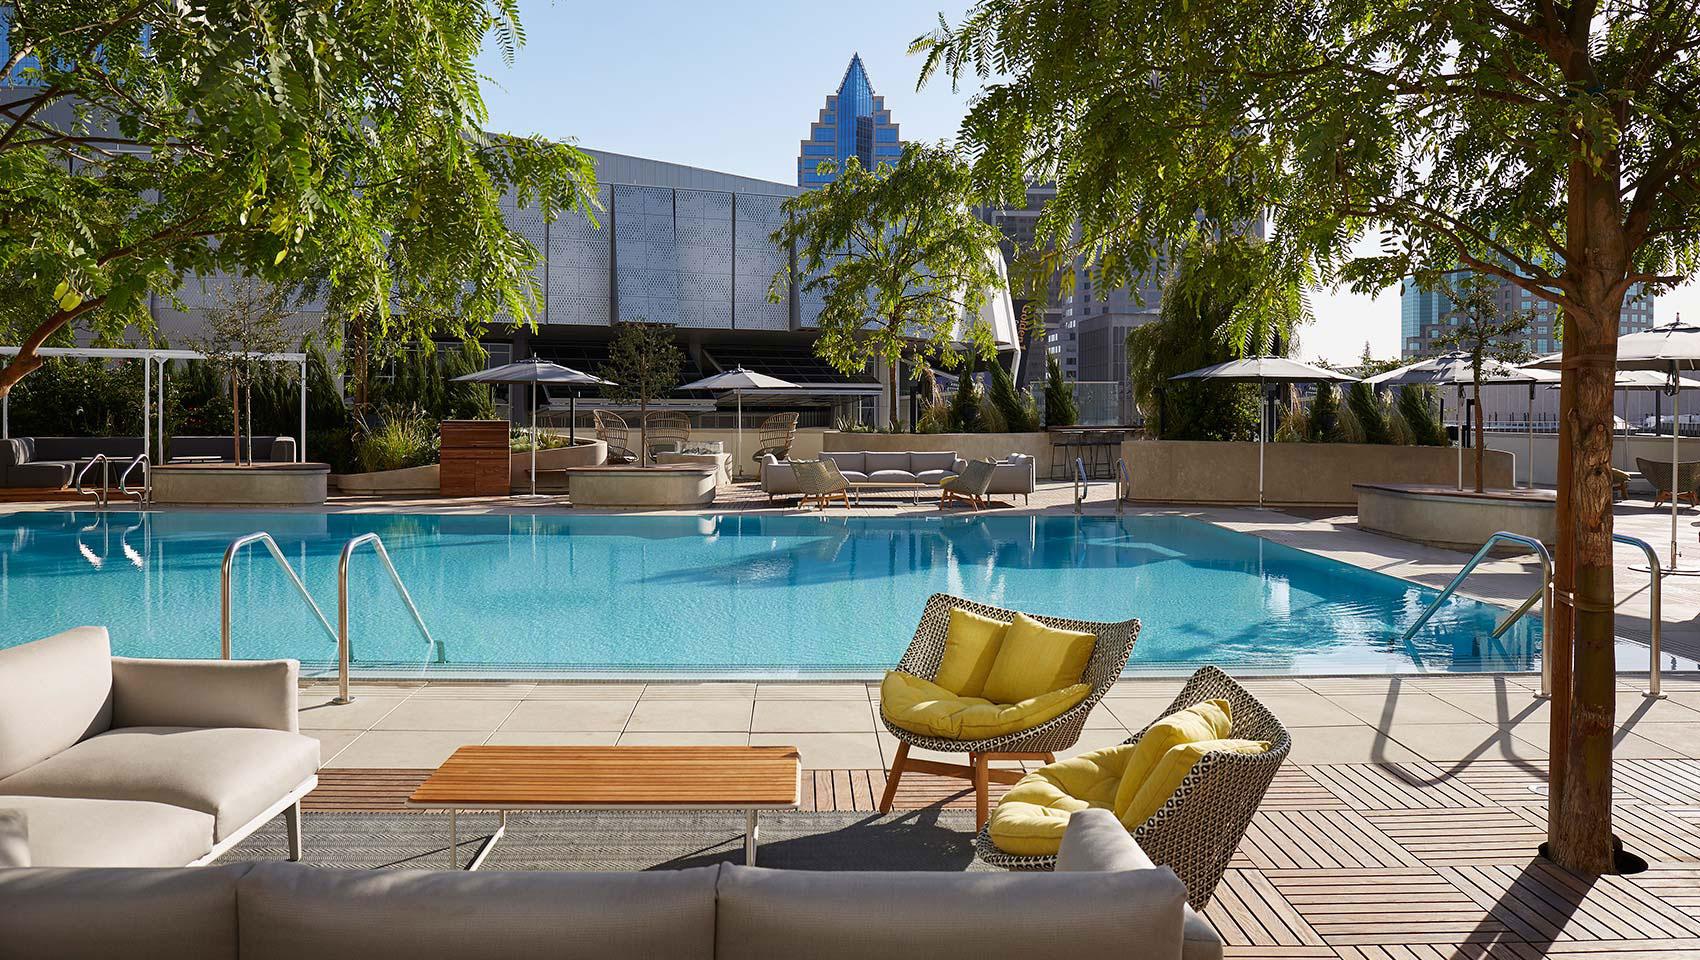 downtown sacramento hotel photos kimpton sawyer hotel. Black Bedroom Furniture Sets. Home Design Ideas